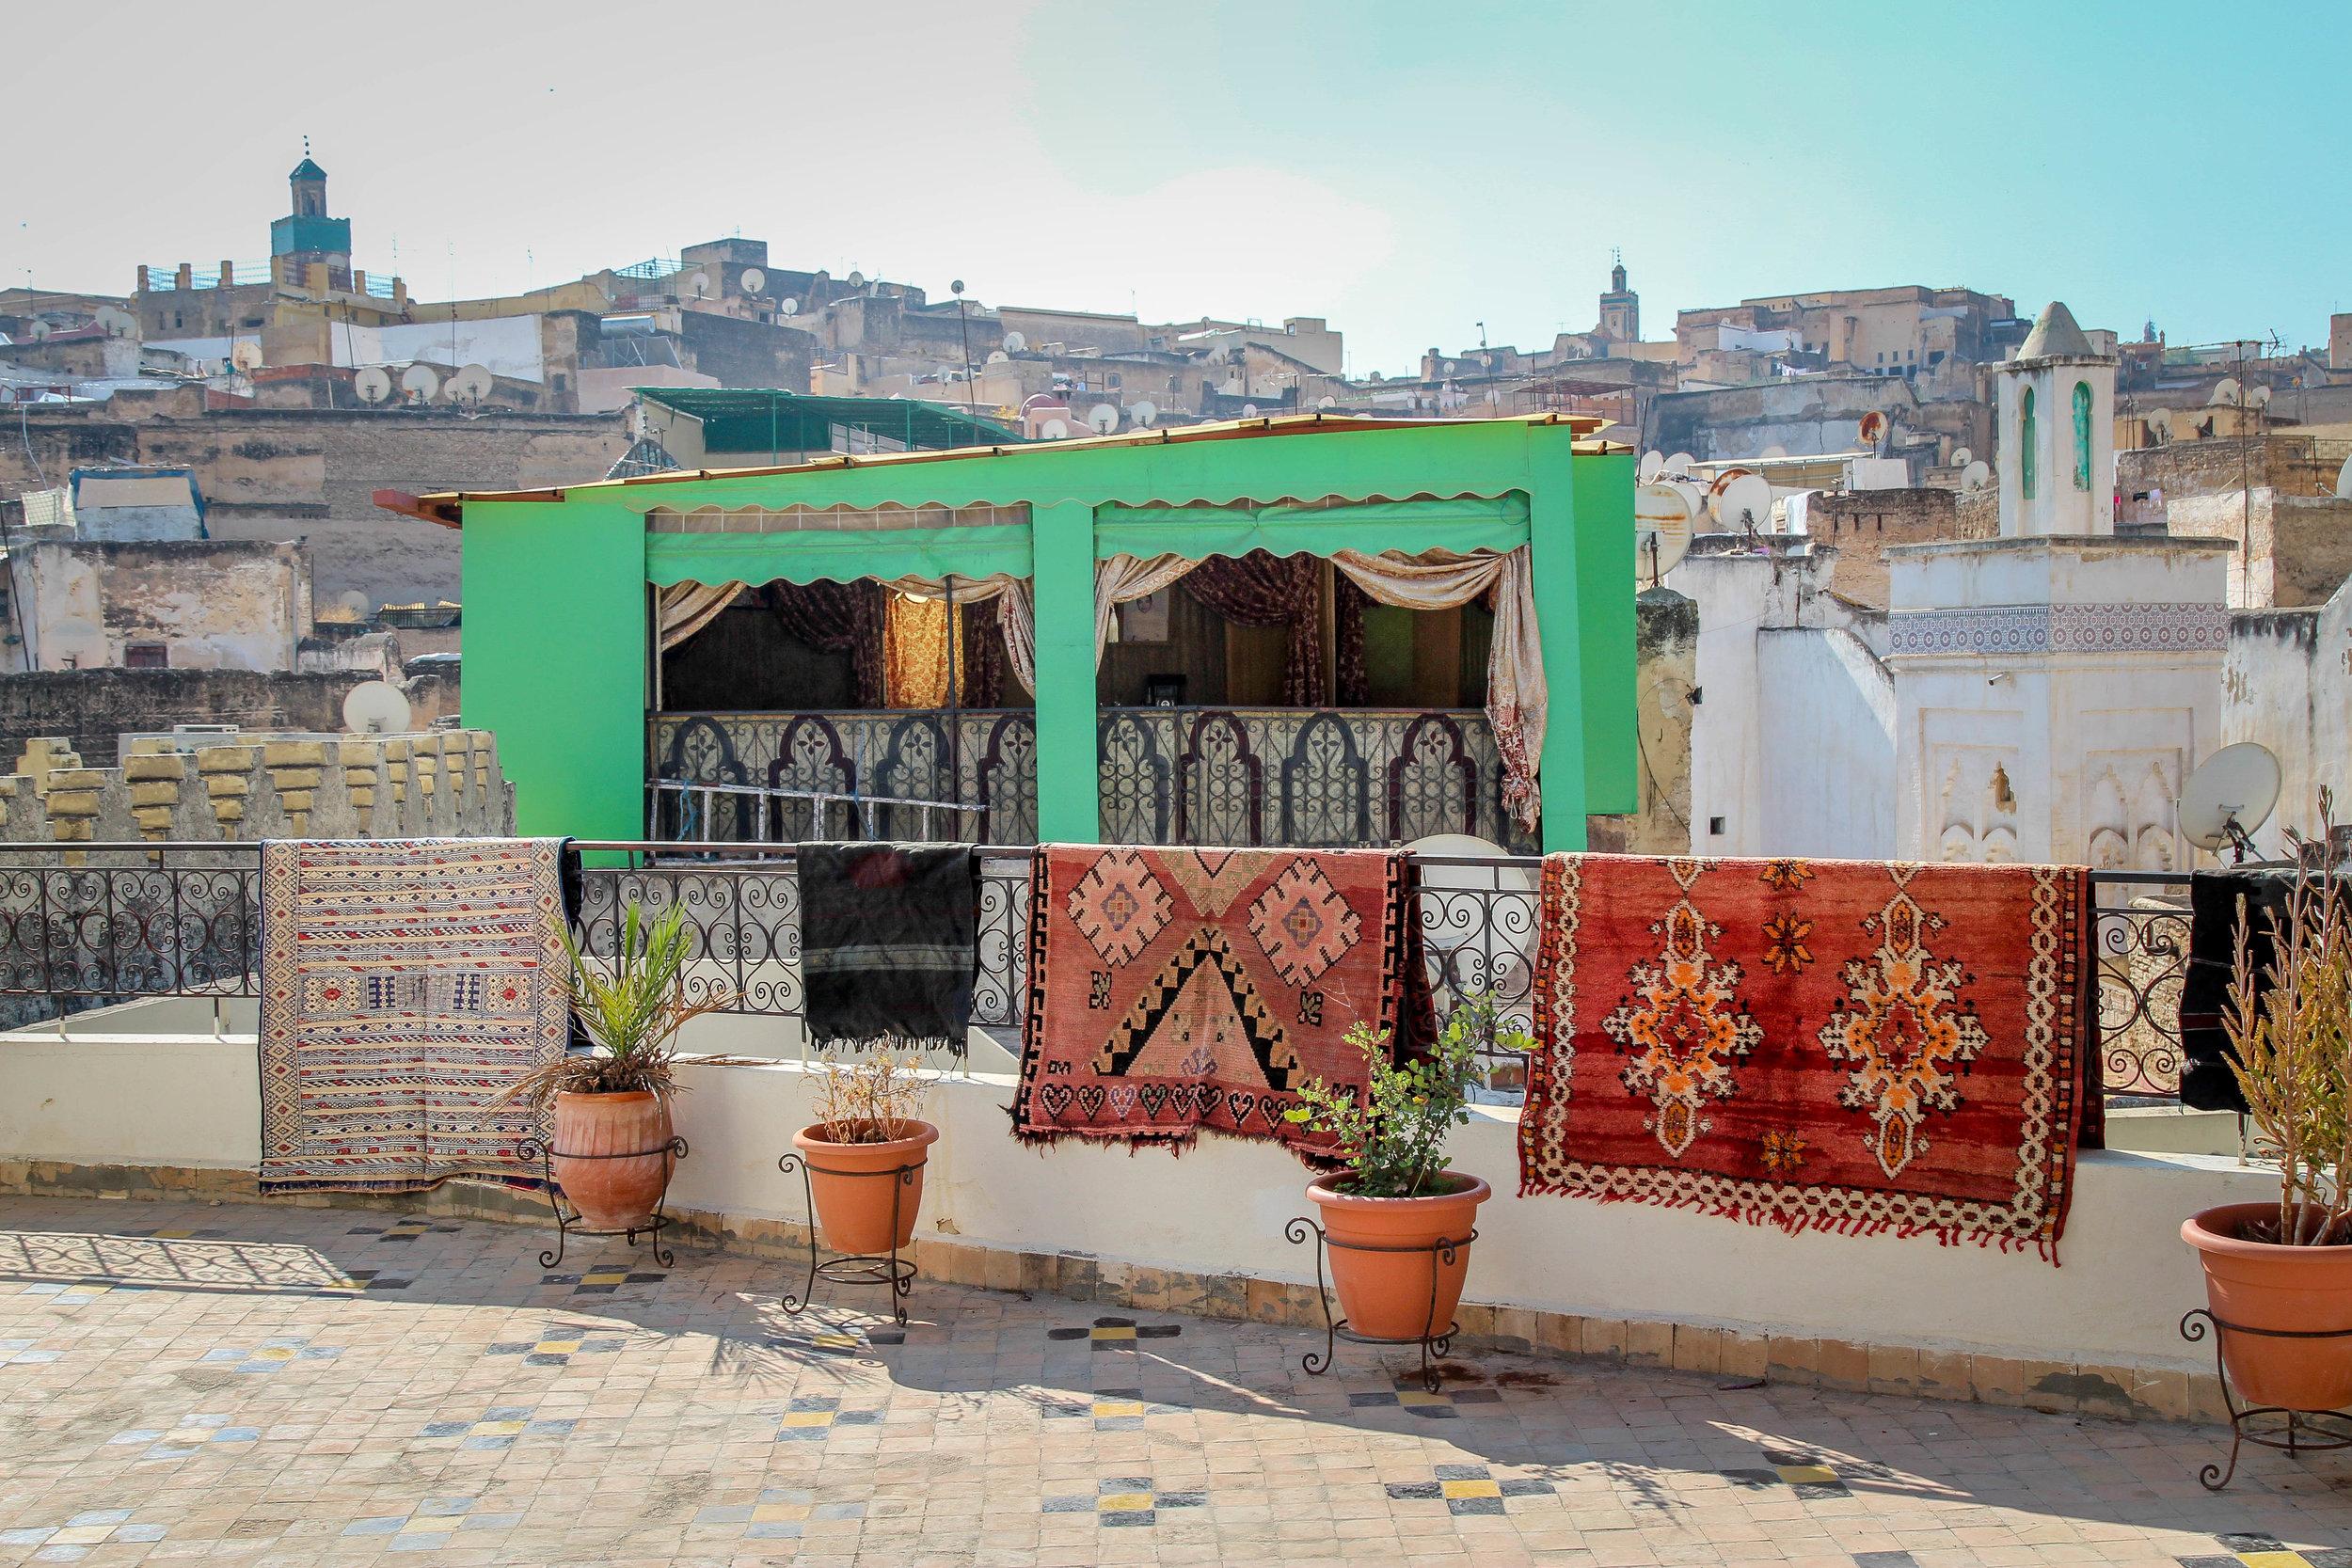 Jen Seiser Morocco Trip 2017 Image 9.jpg